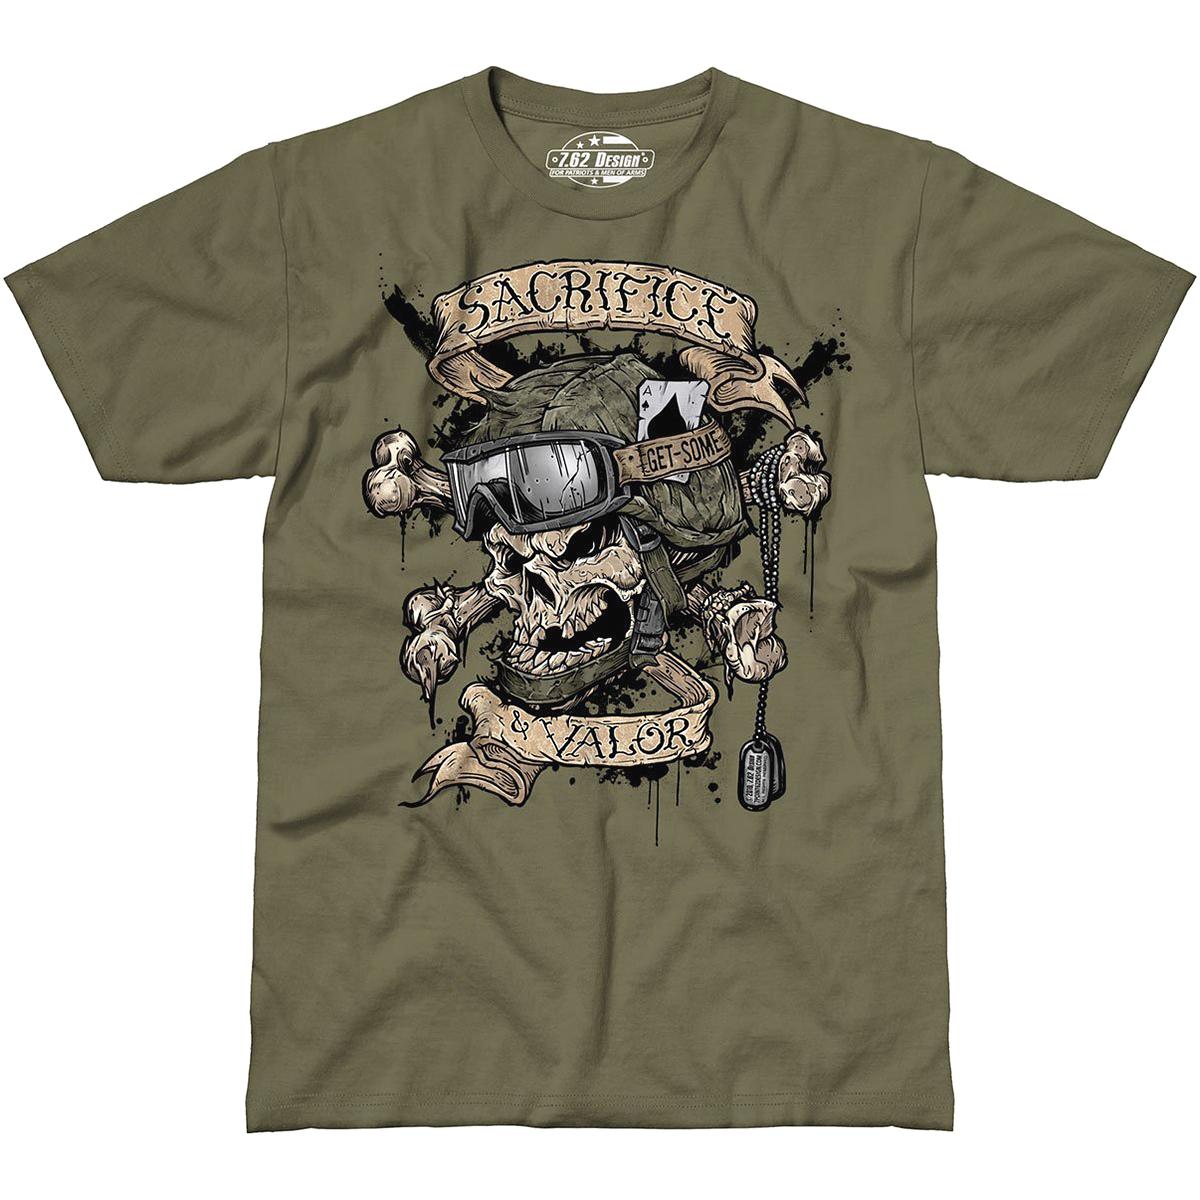 Design sacrifice valor mens t shirt airsoft sniper for Army design shirts online